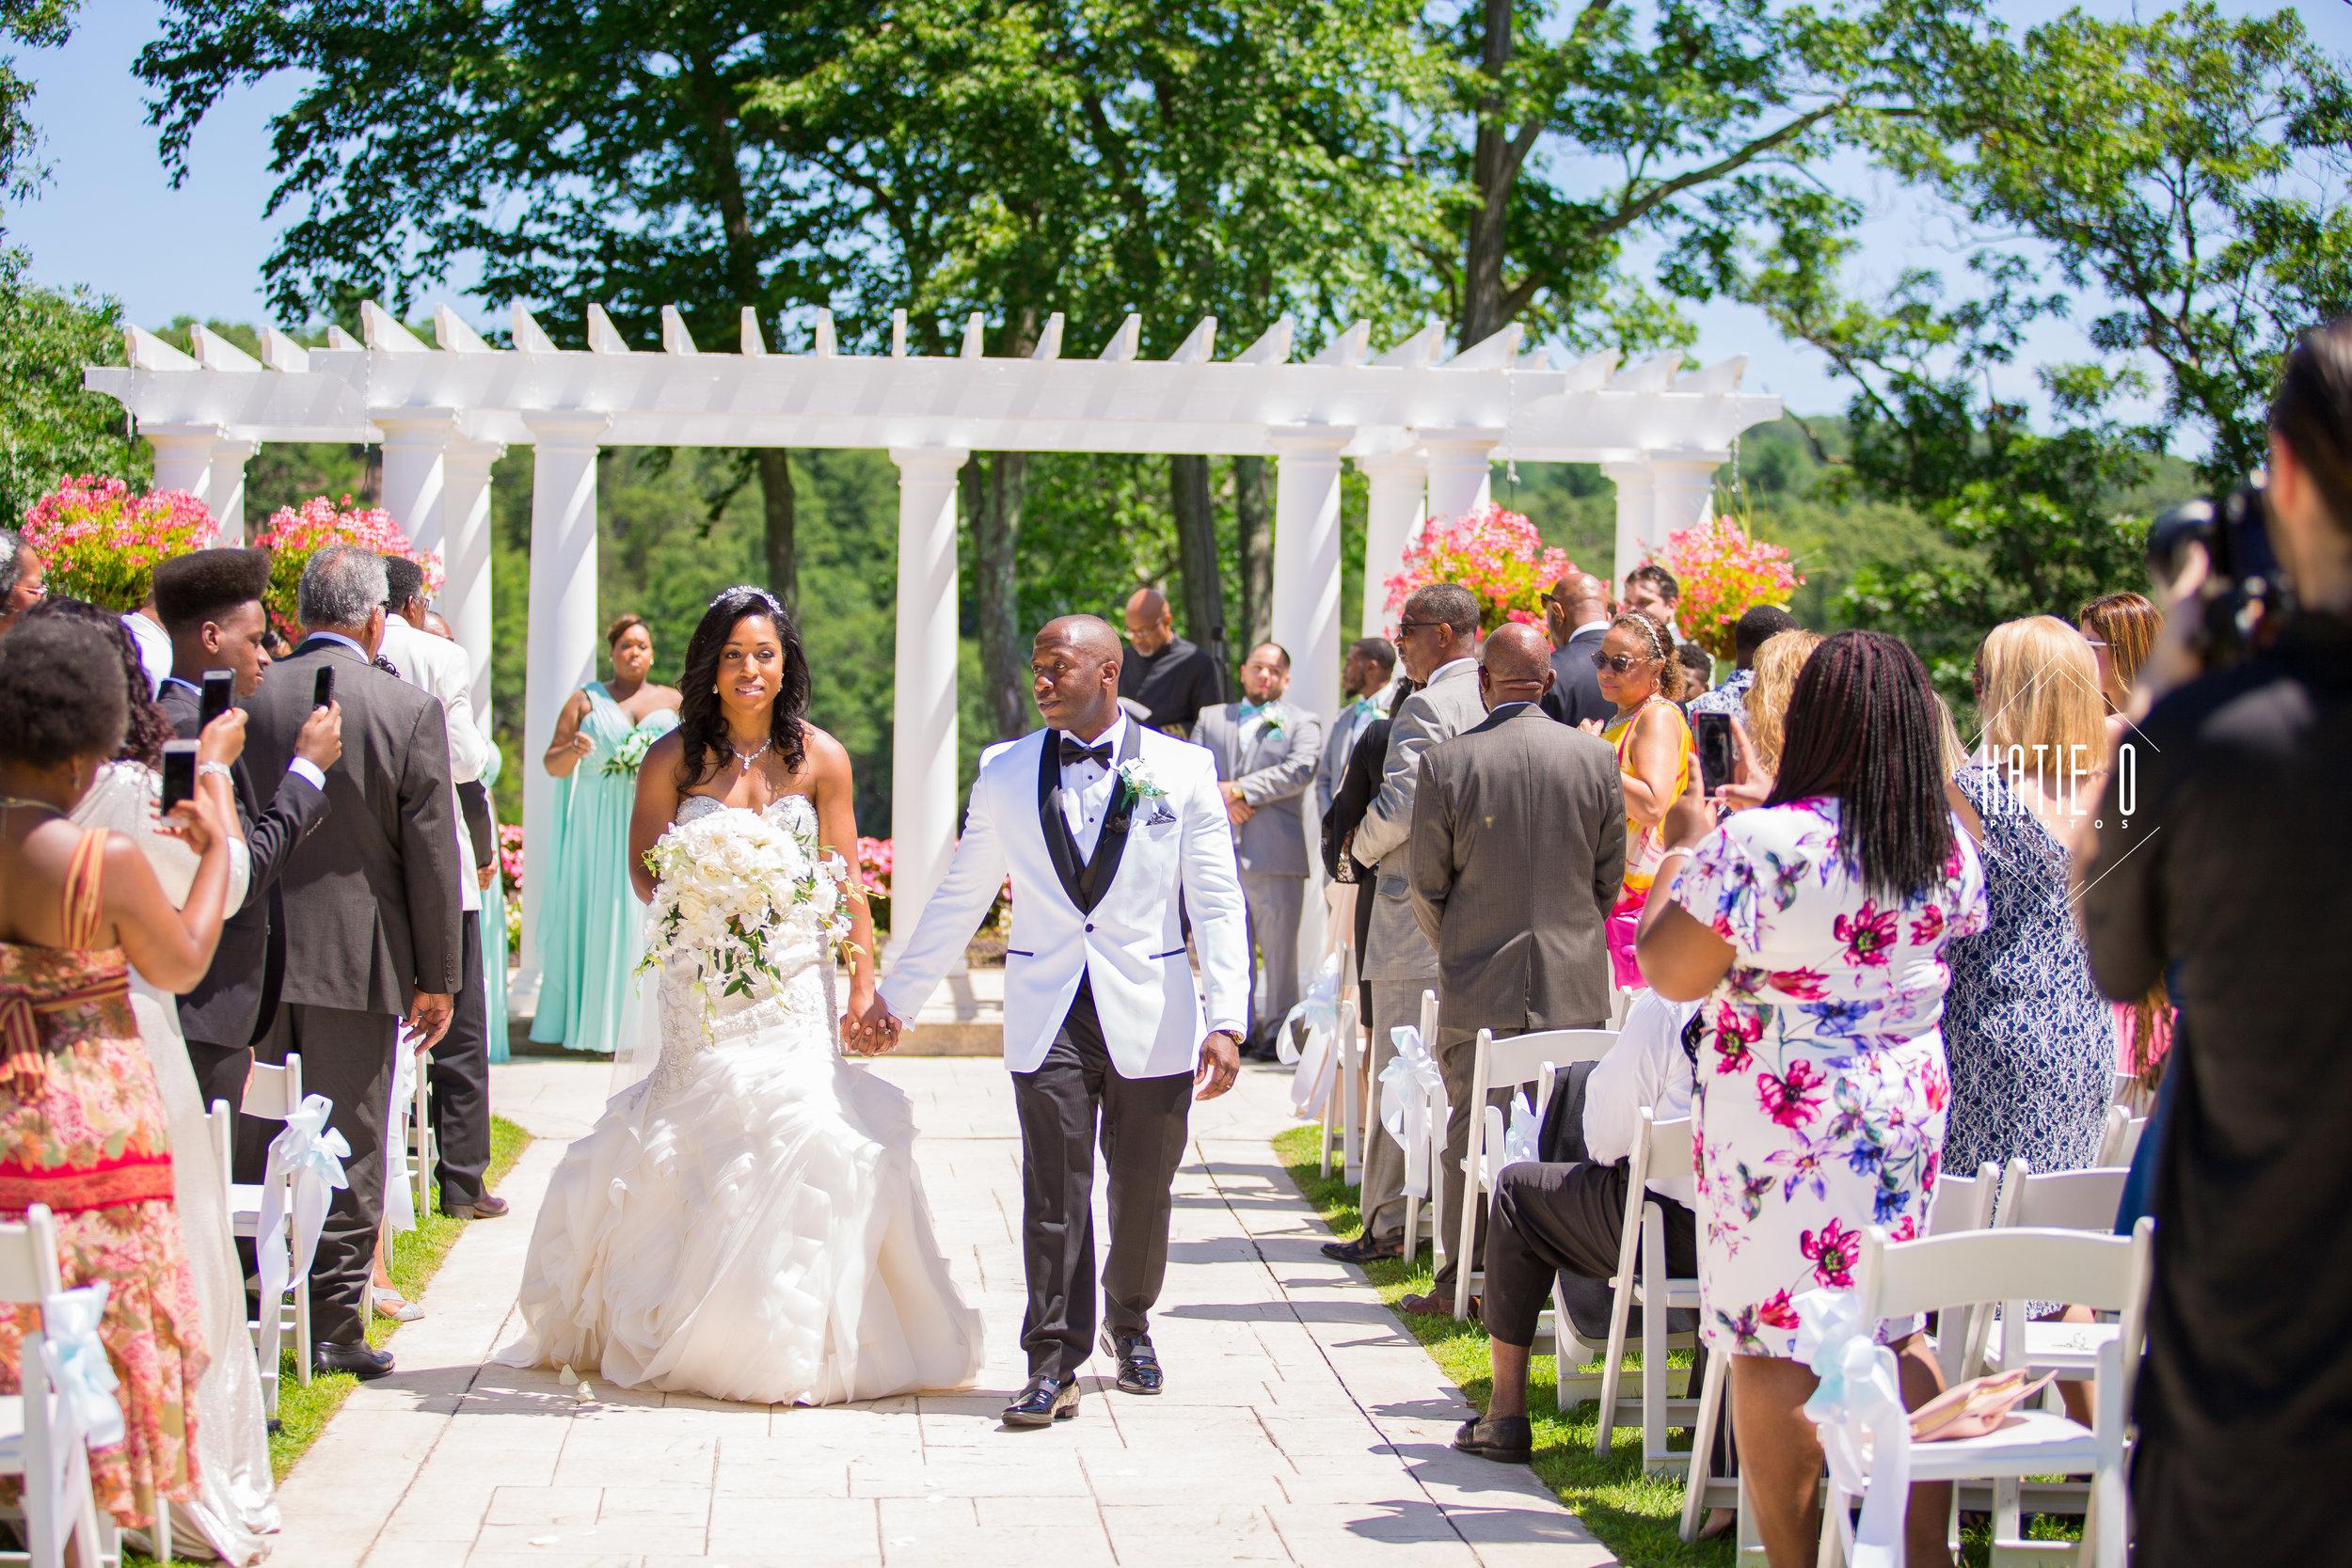 CT-WEDDING-PHOTOGRAPHER-BLOG-24.jpg